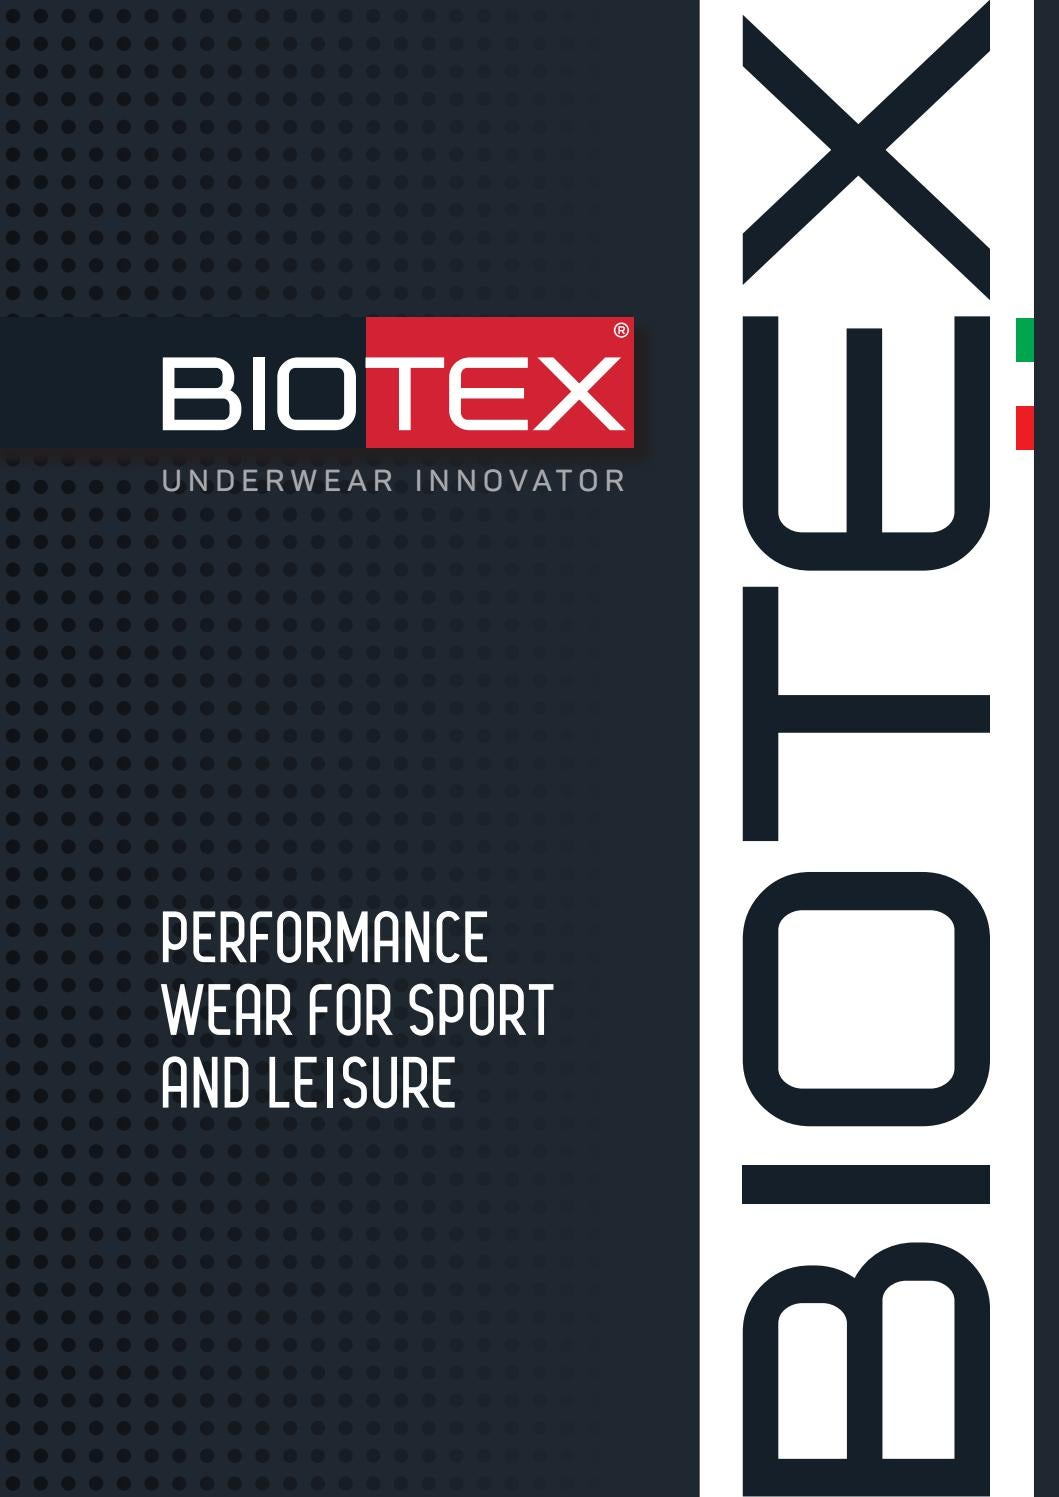 Canotta Seamless Uomo BIOTEX Bioflex